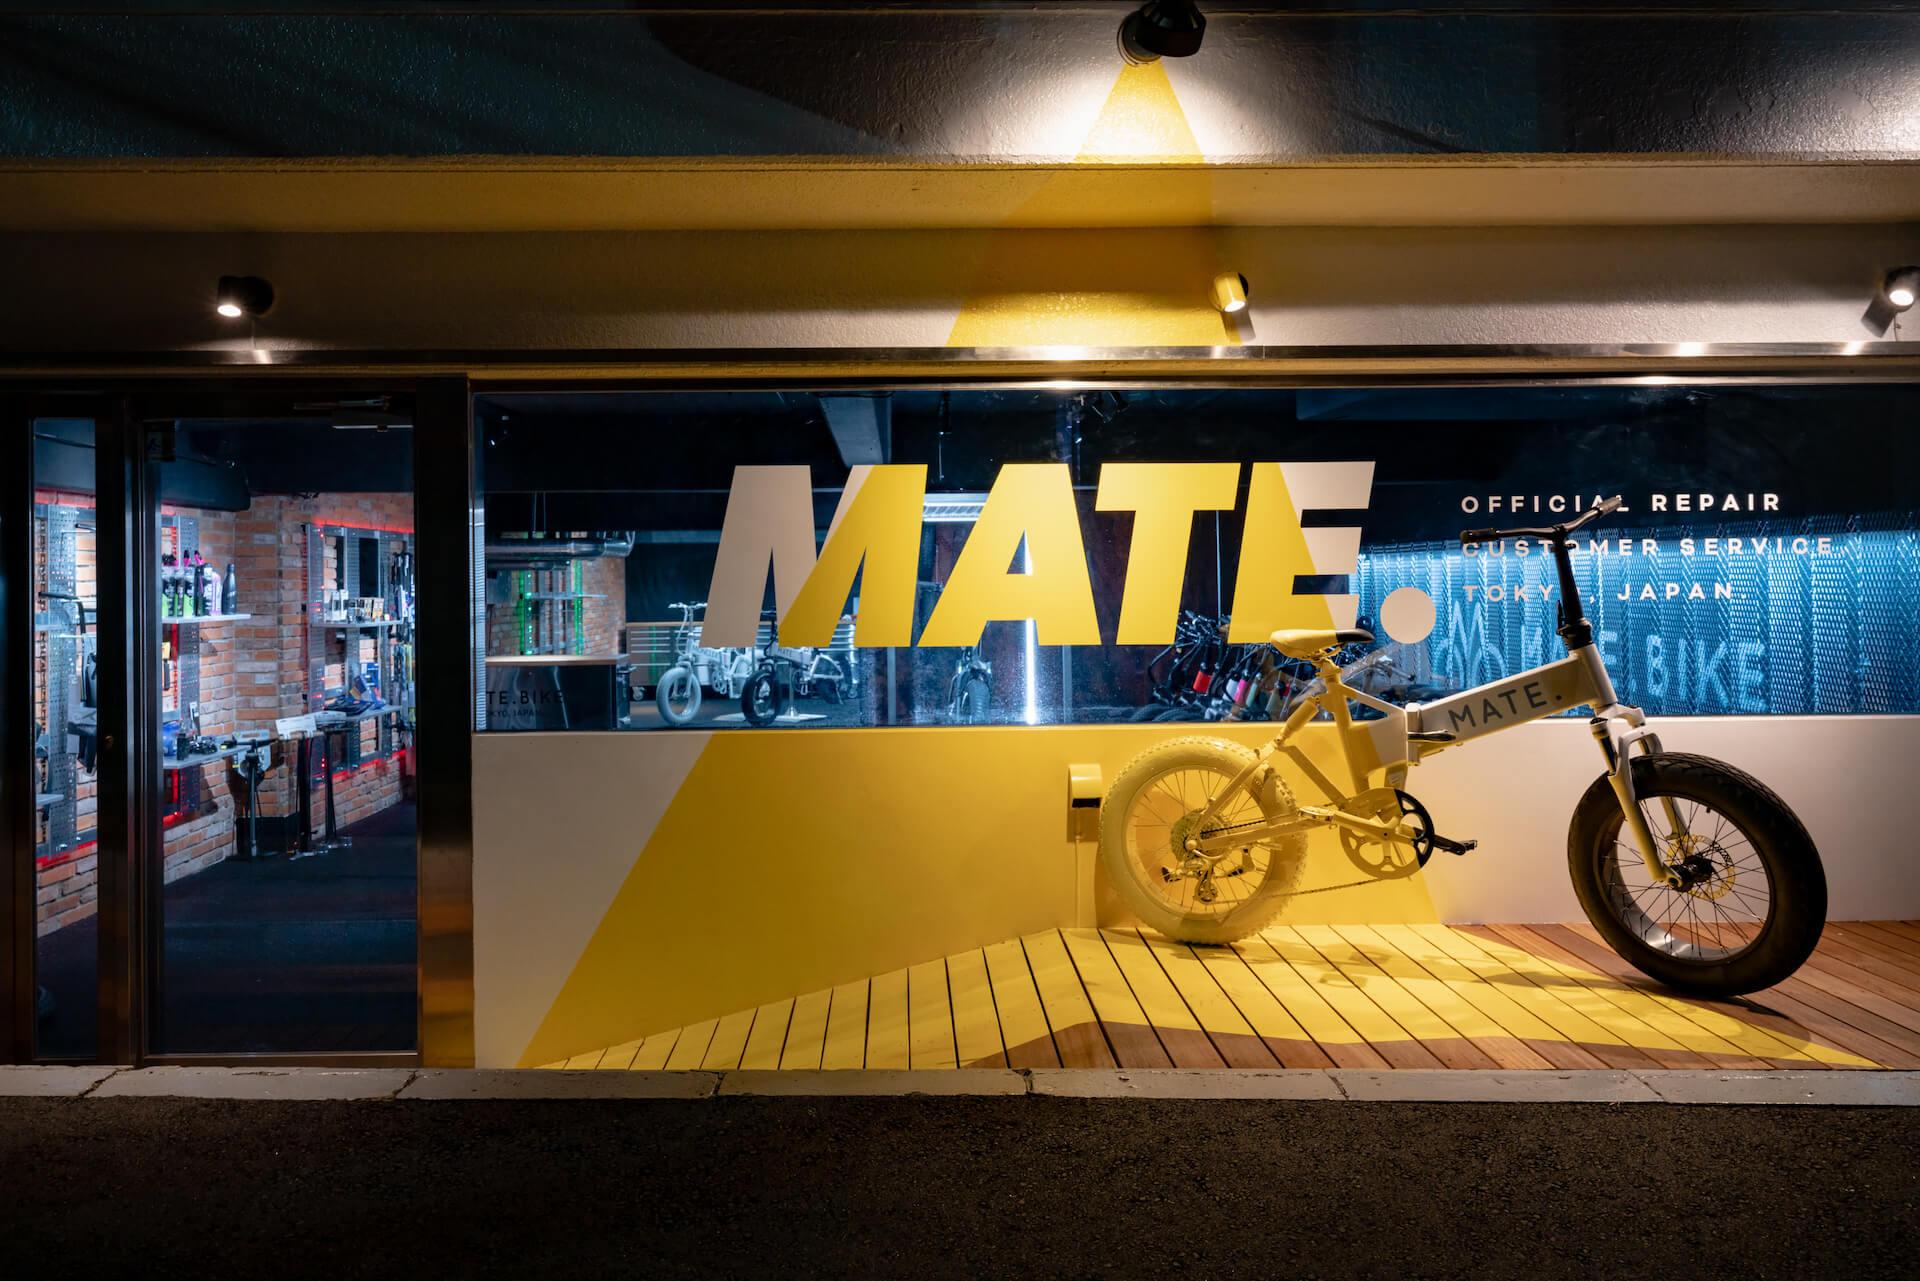 e-BIKE初のリペア&カスタムサービスを提供するラボ『MATE.BIKE SERVICE LABO Repair&Custom』が誕生! life210901_matebike_1